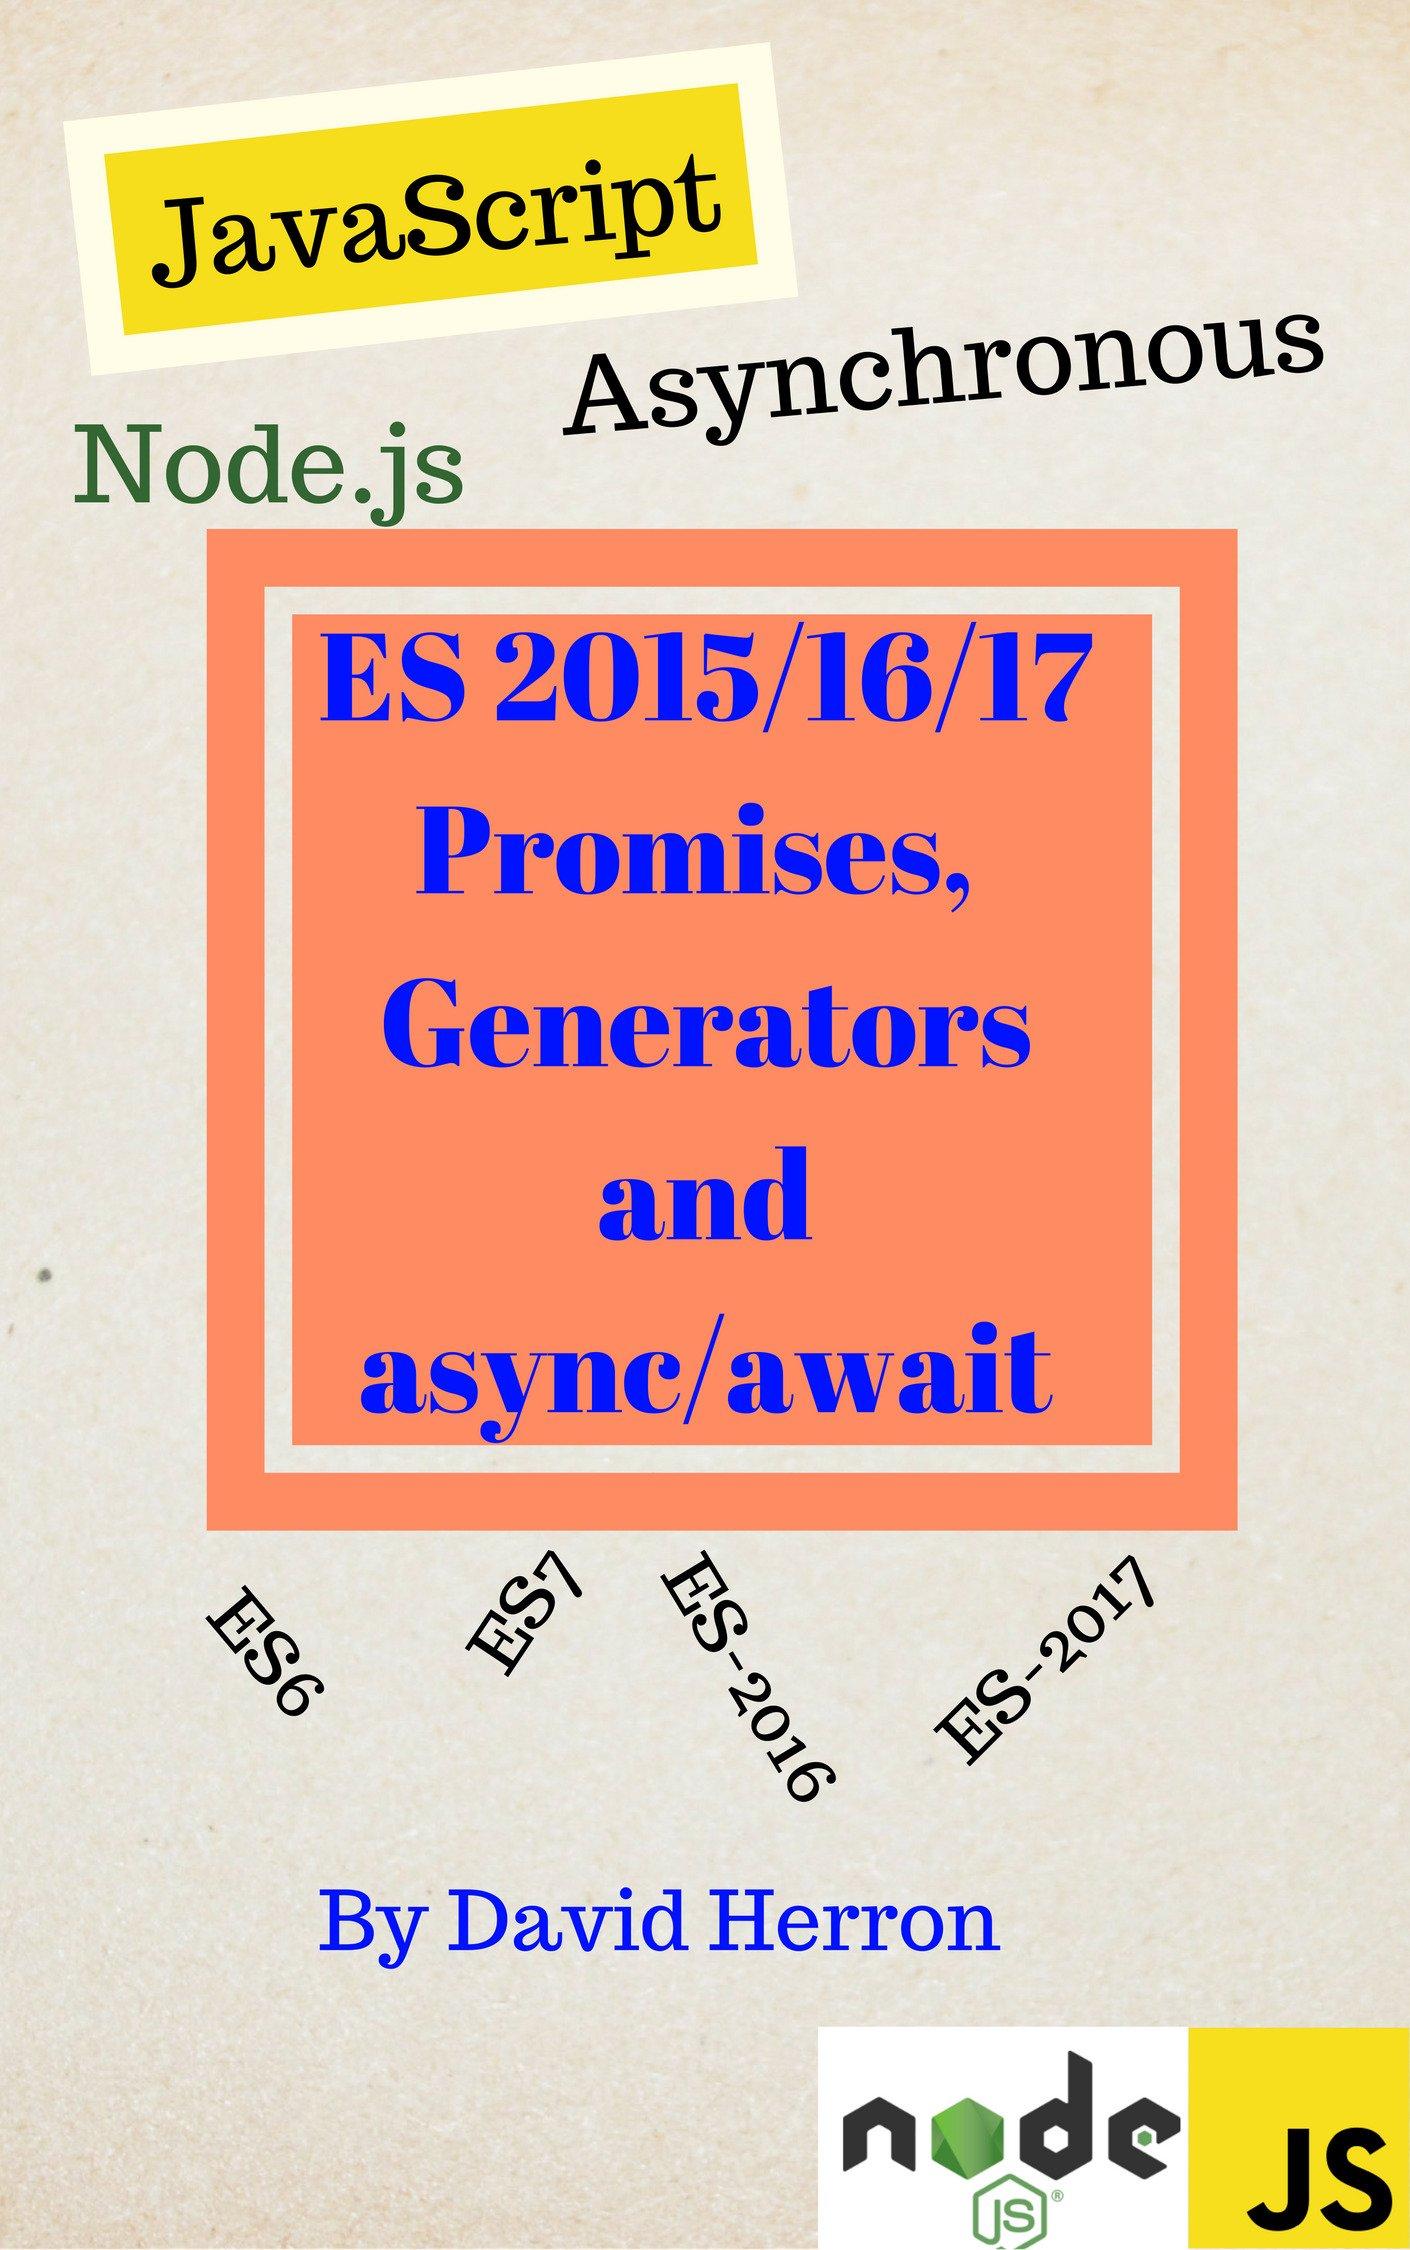 Asynchronous Node.js/JavaScript with ES-2015/2016 Promises, Generators and Async/Await